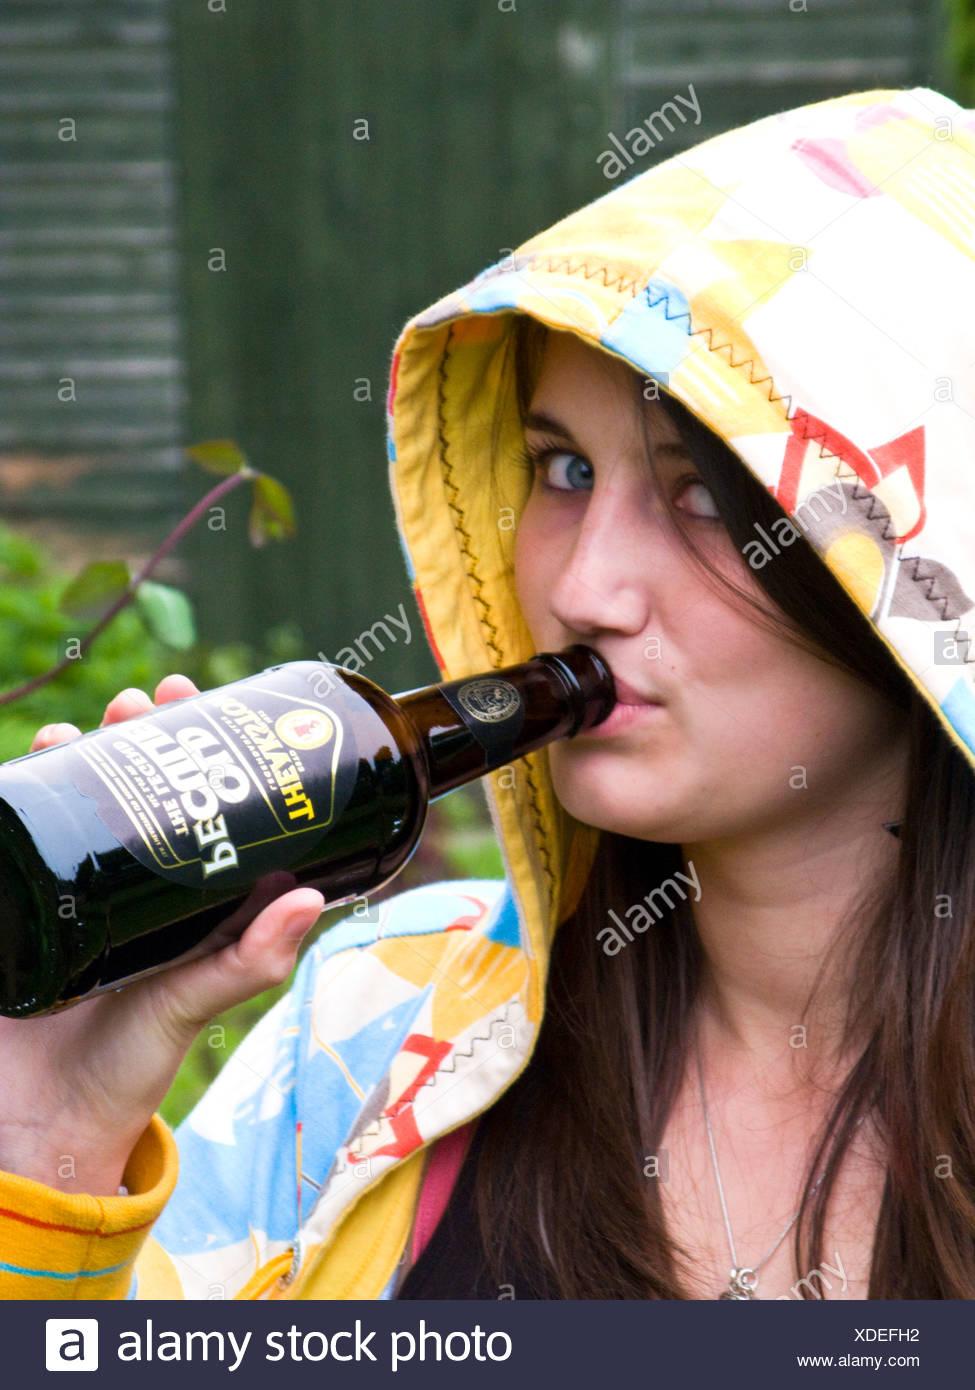 teenager drinking beer Stock Photo